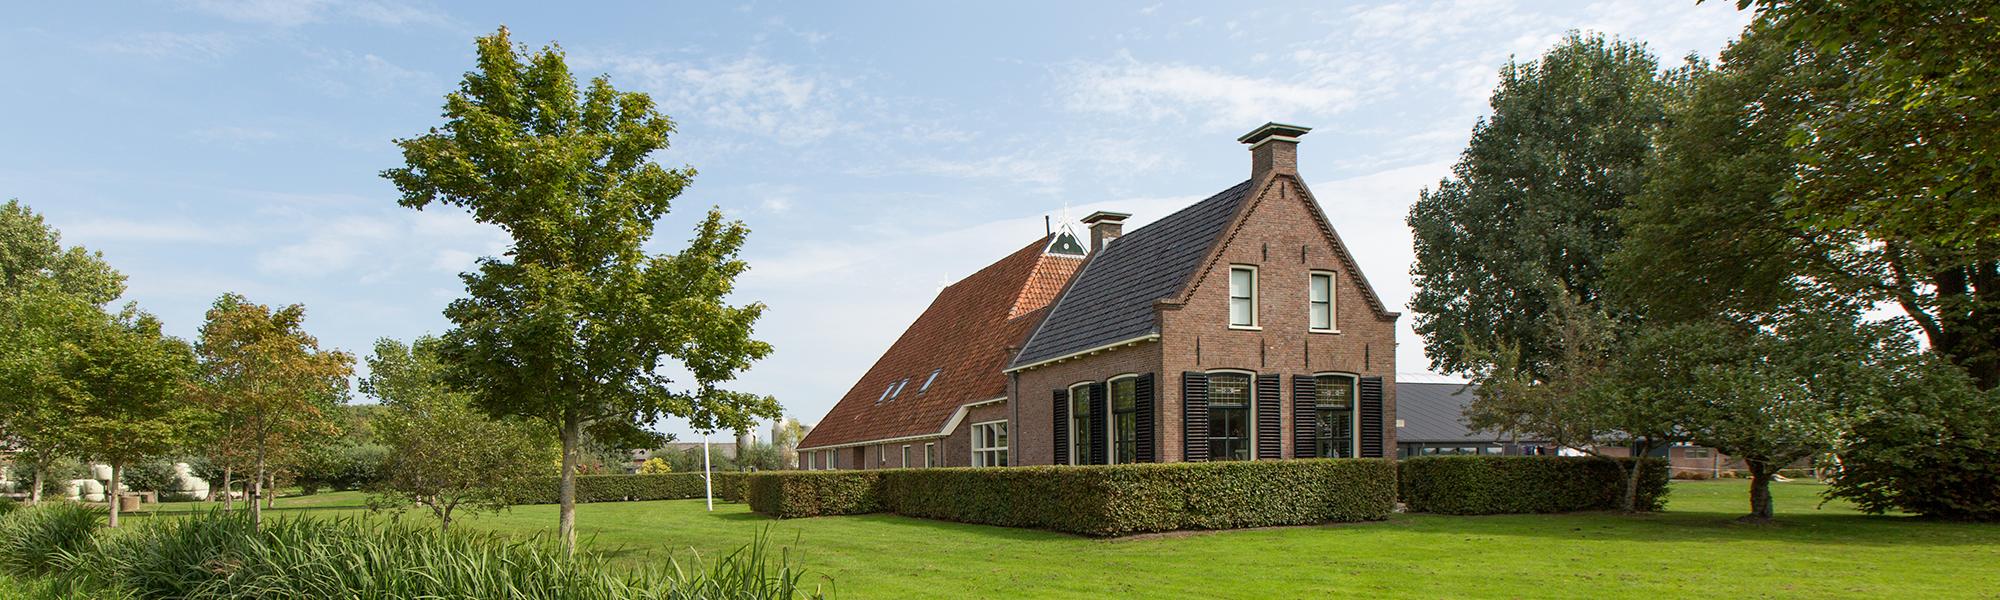 Brandsma agrarisch vastgoed, agrarisch makelaar in Friesland